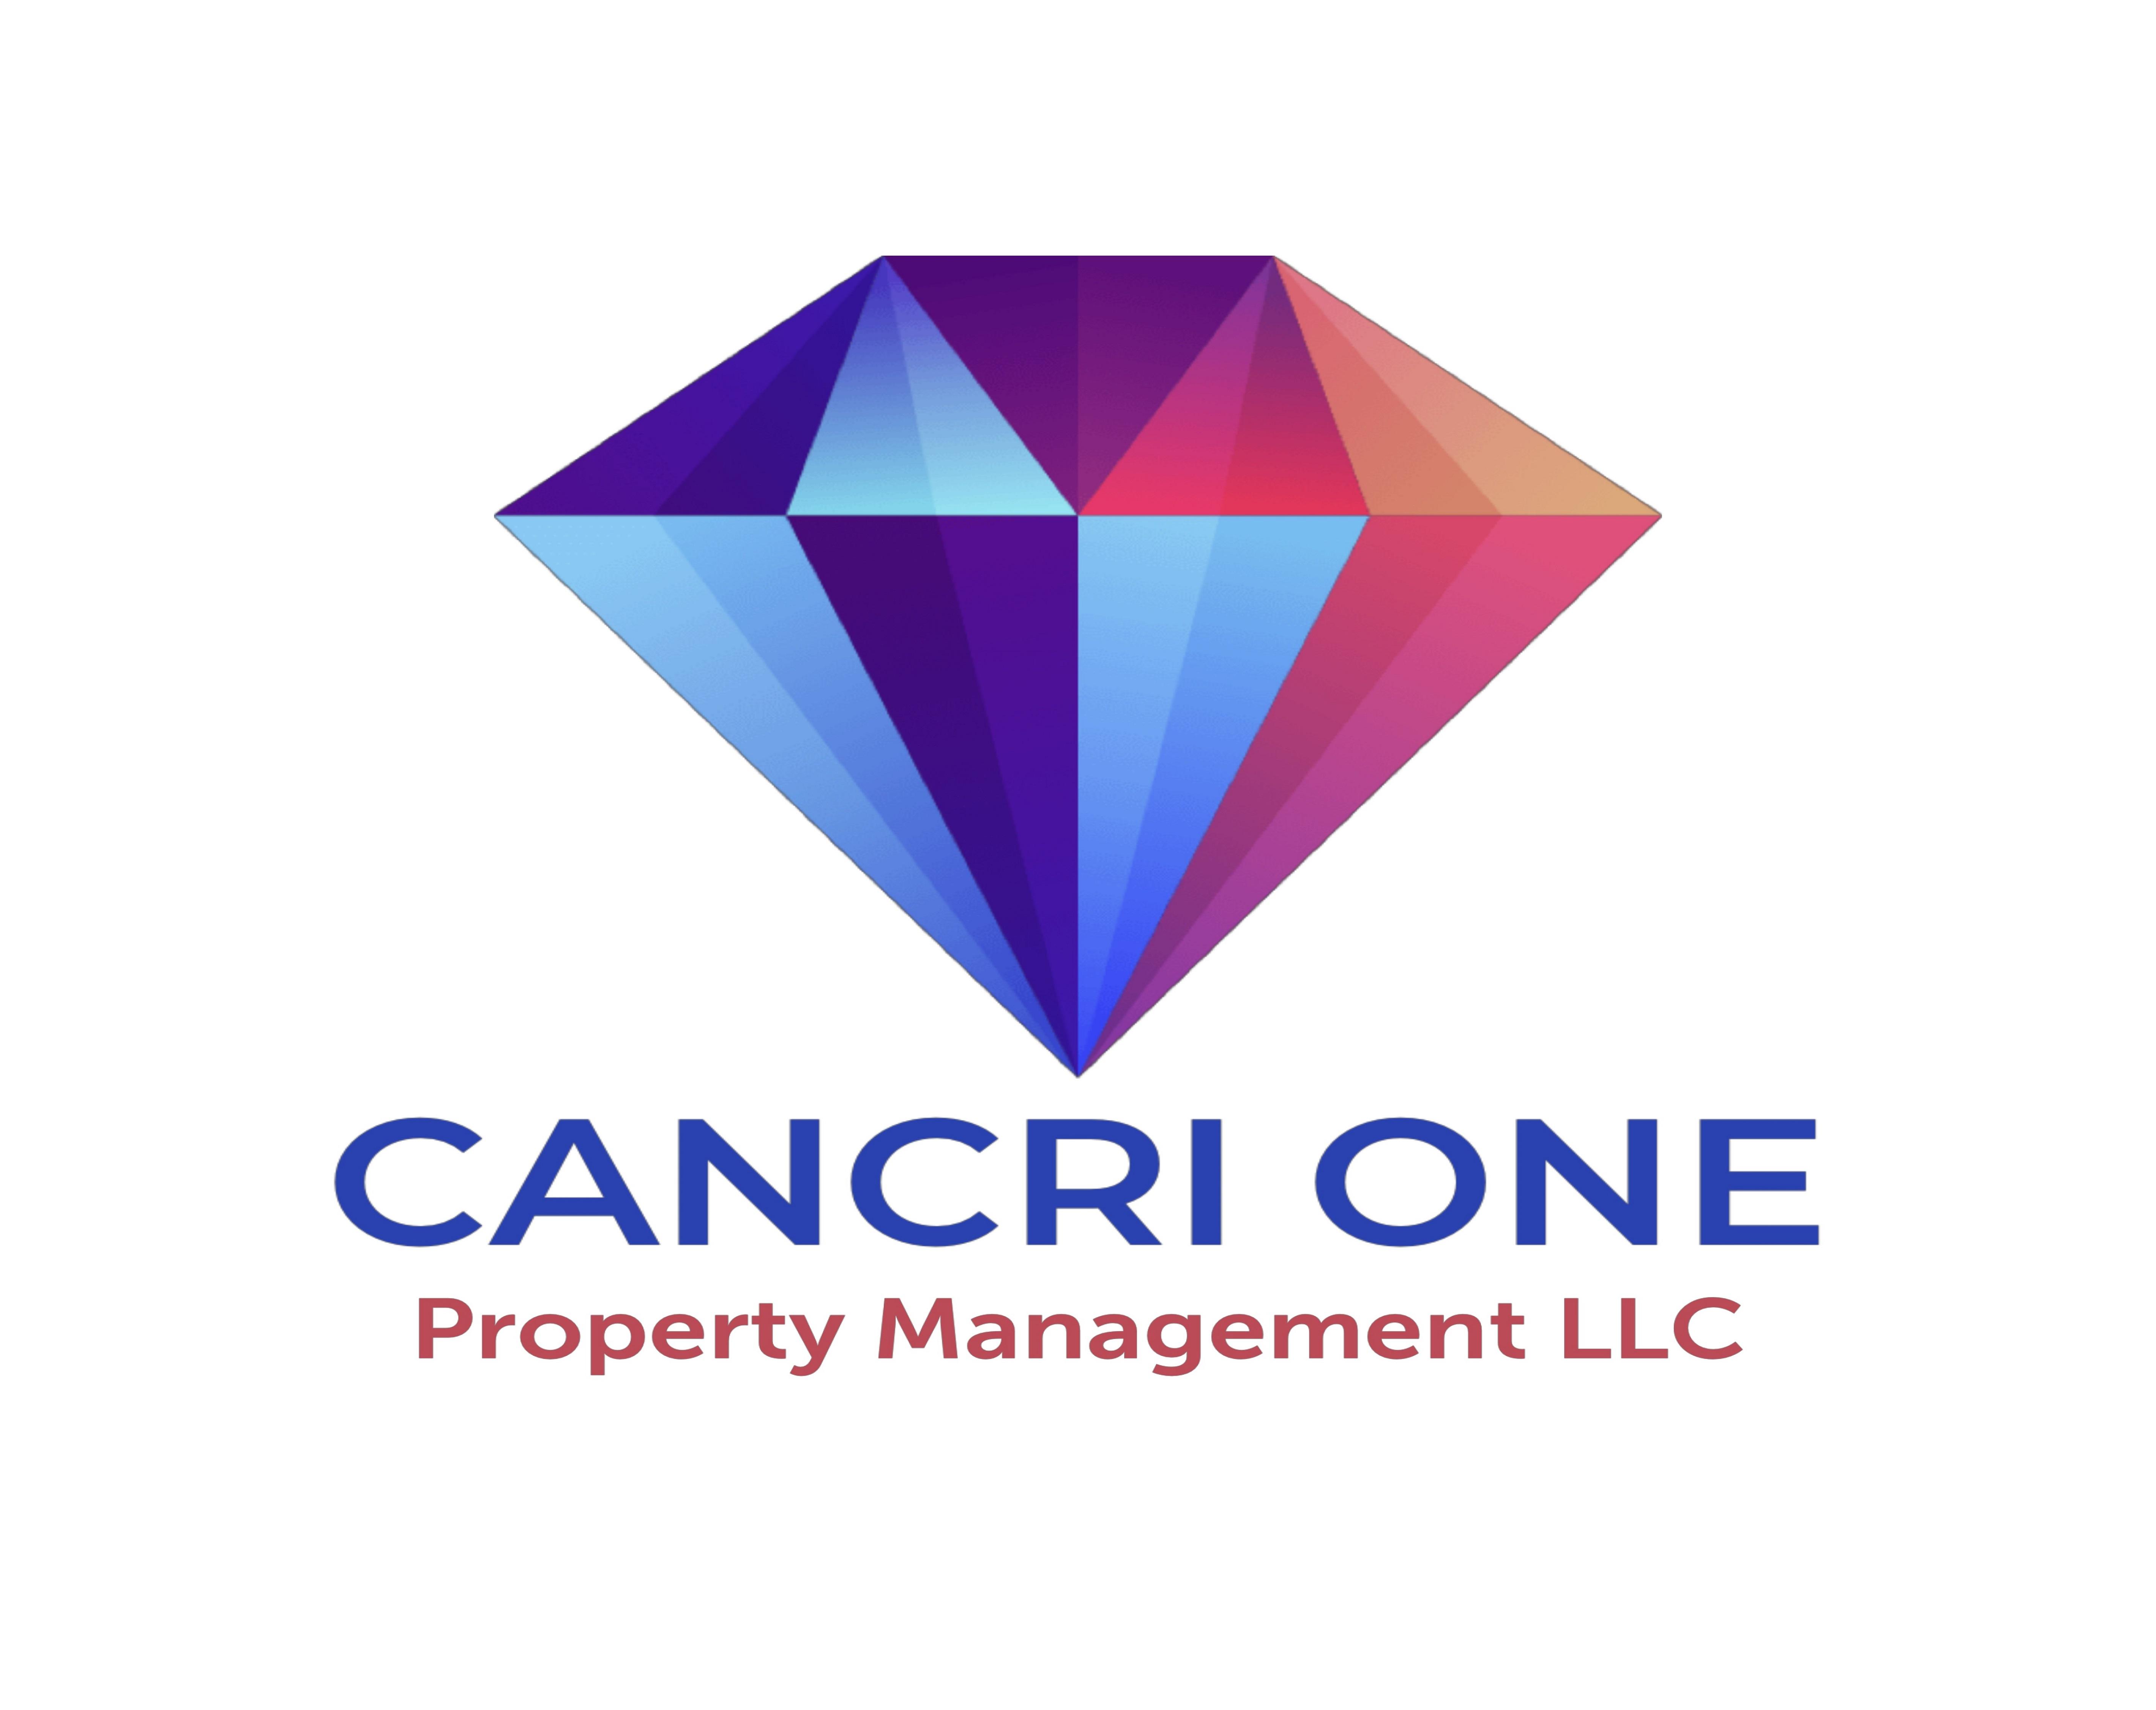 CANCRI ONE PROPERTY MANAGEMENT L.L.C.